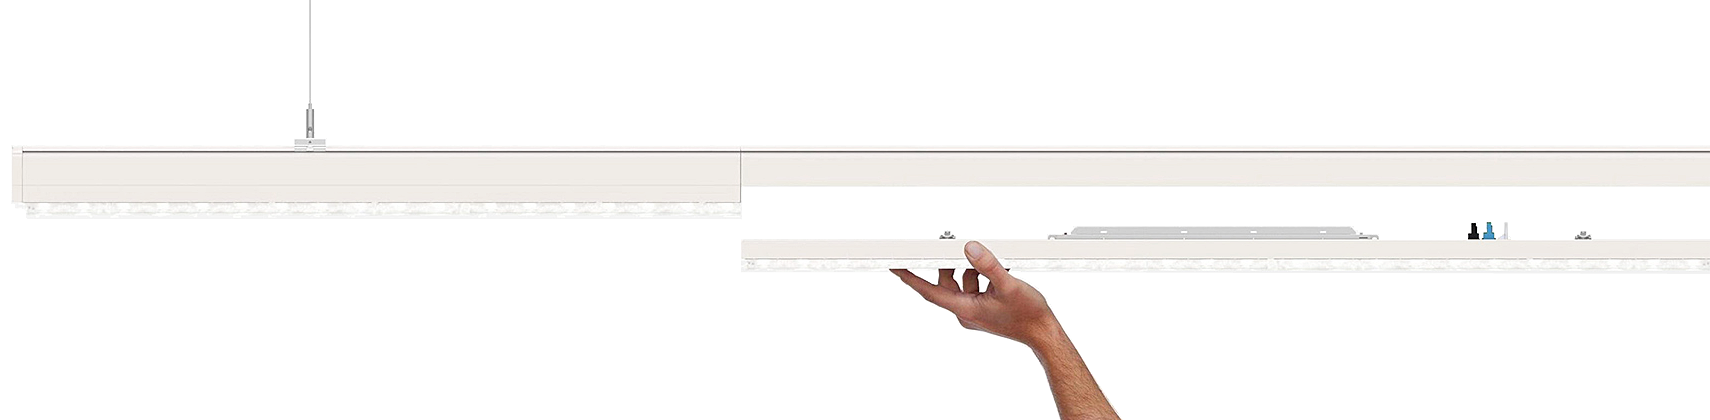 LED-Lichtband-Komplettsystem LSL-06-73-IP54